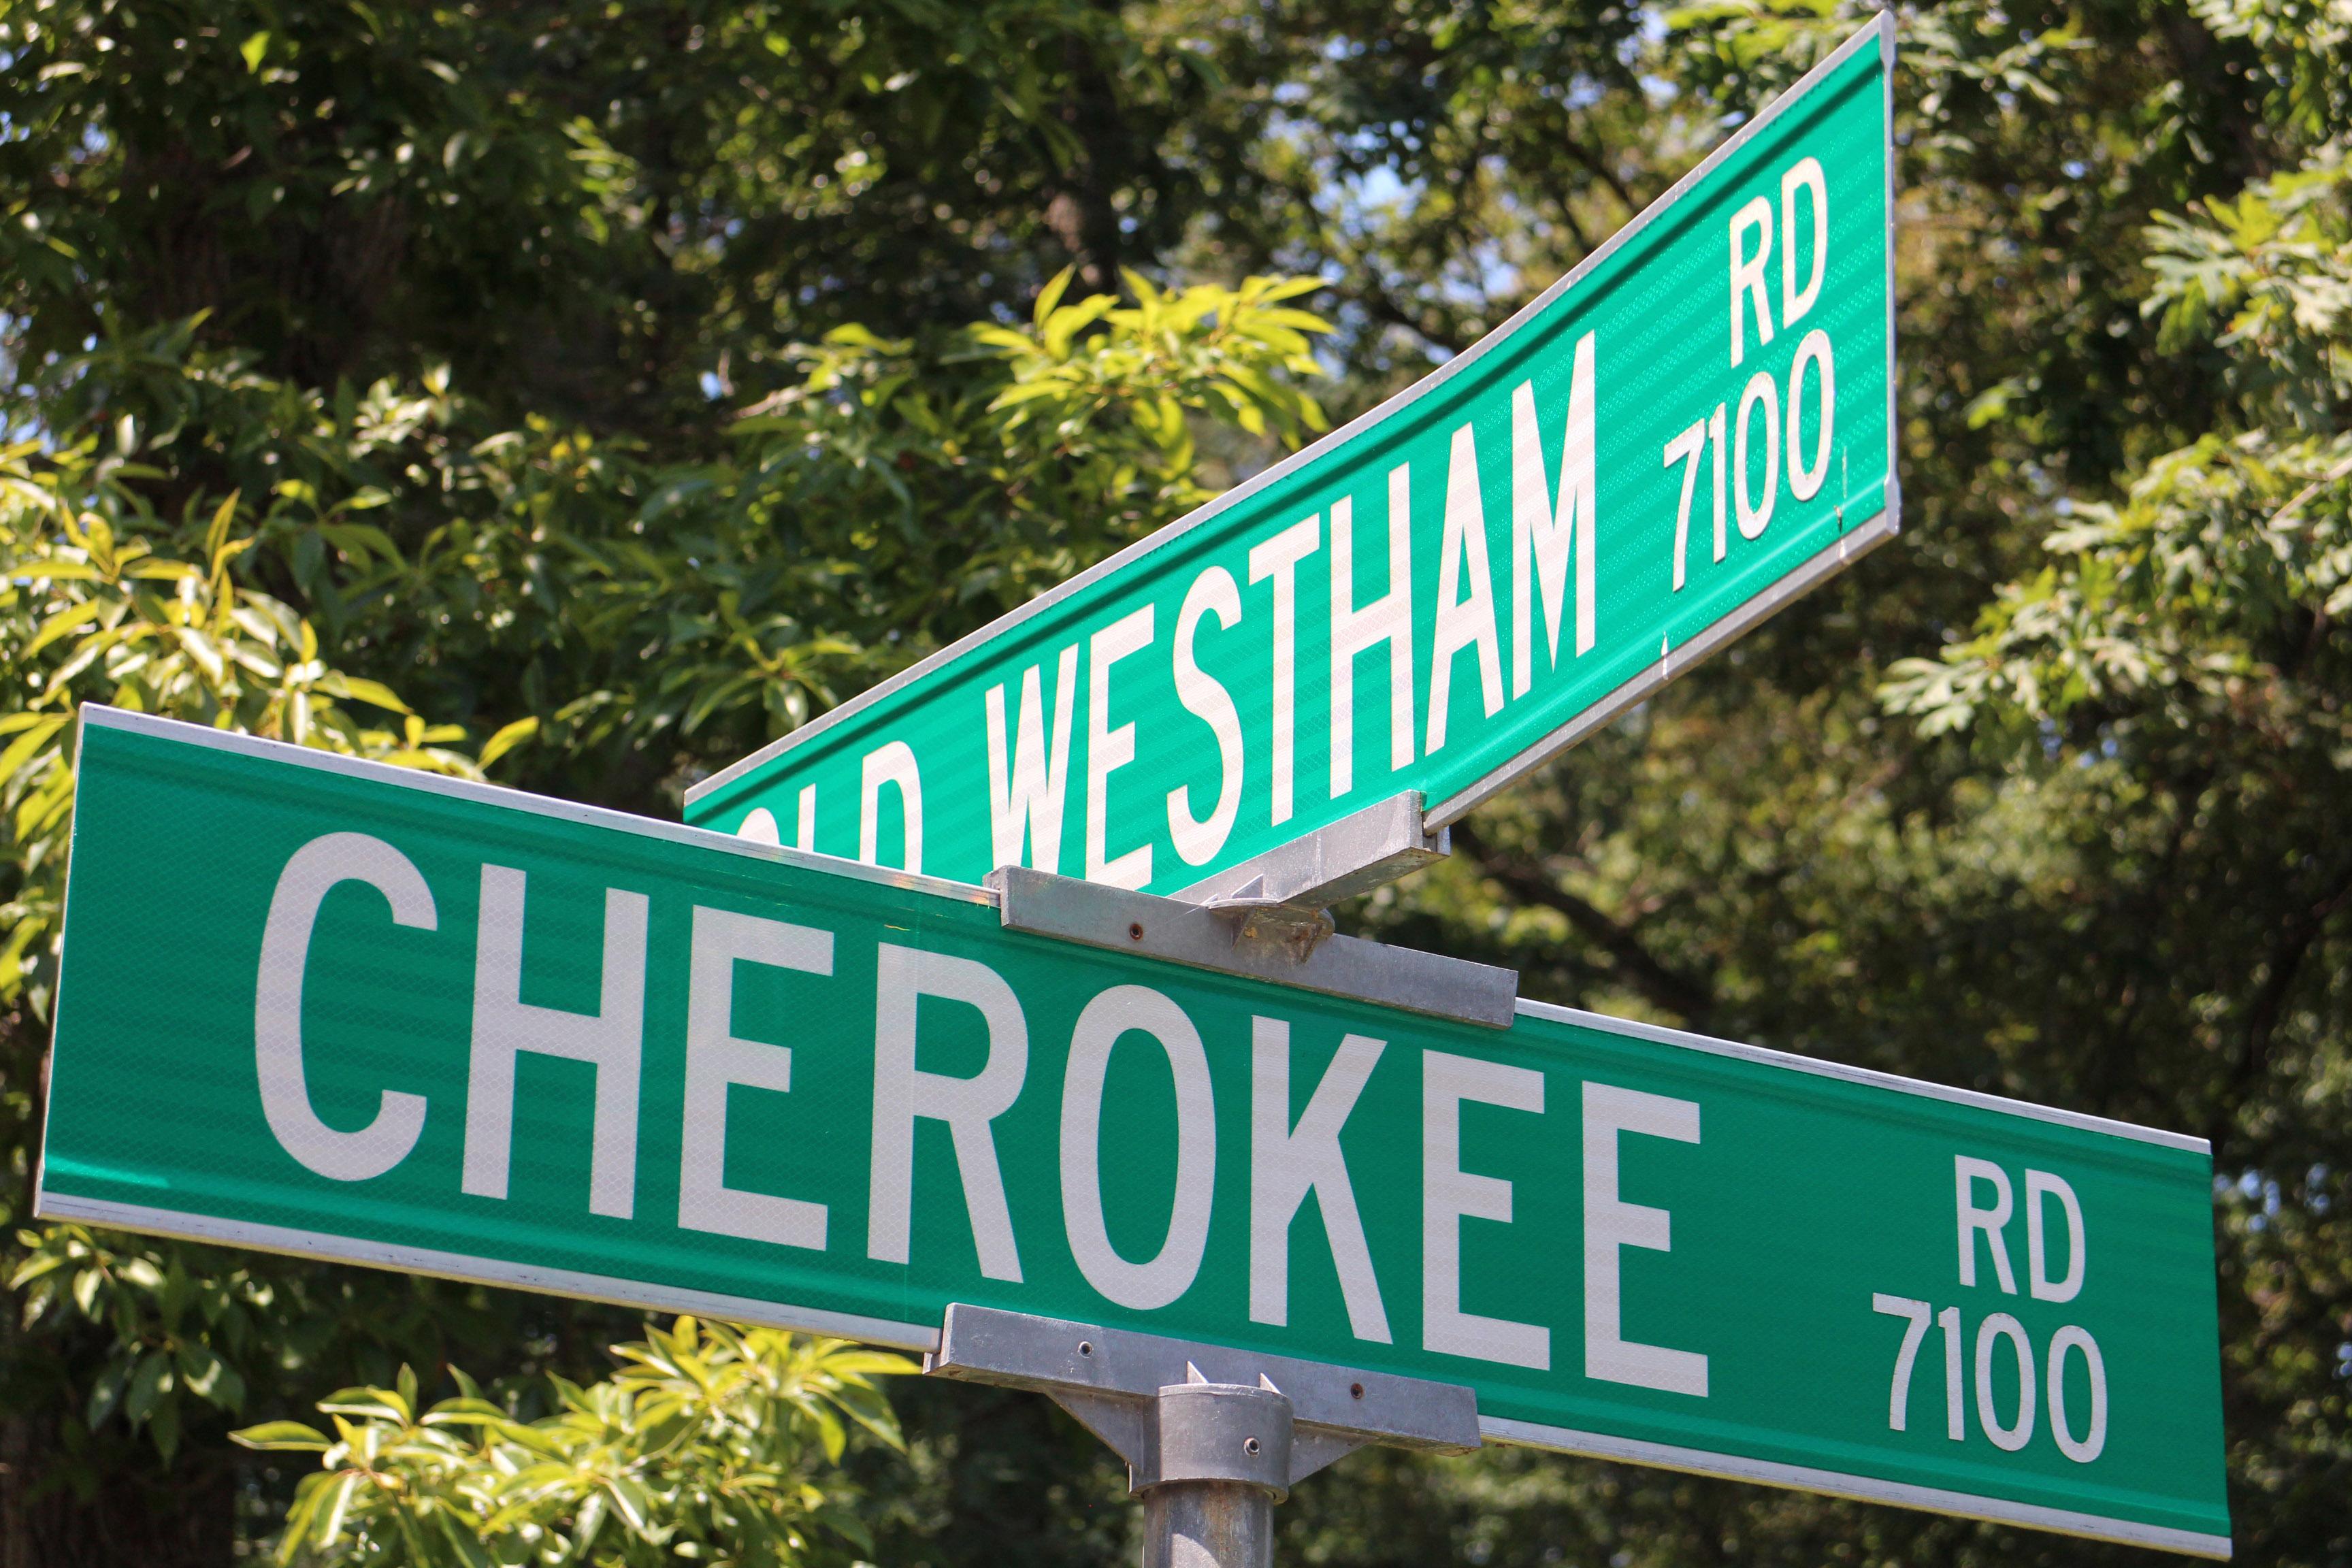 Cherokee Road